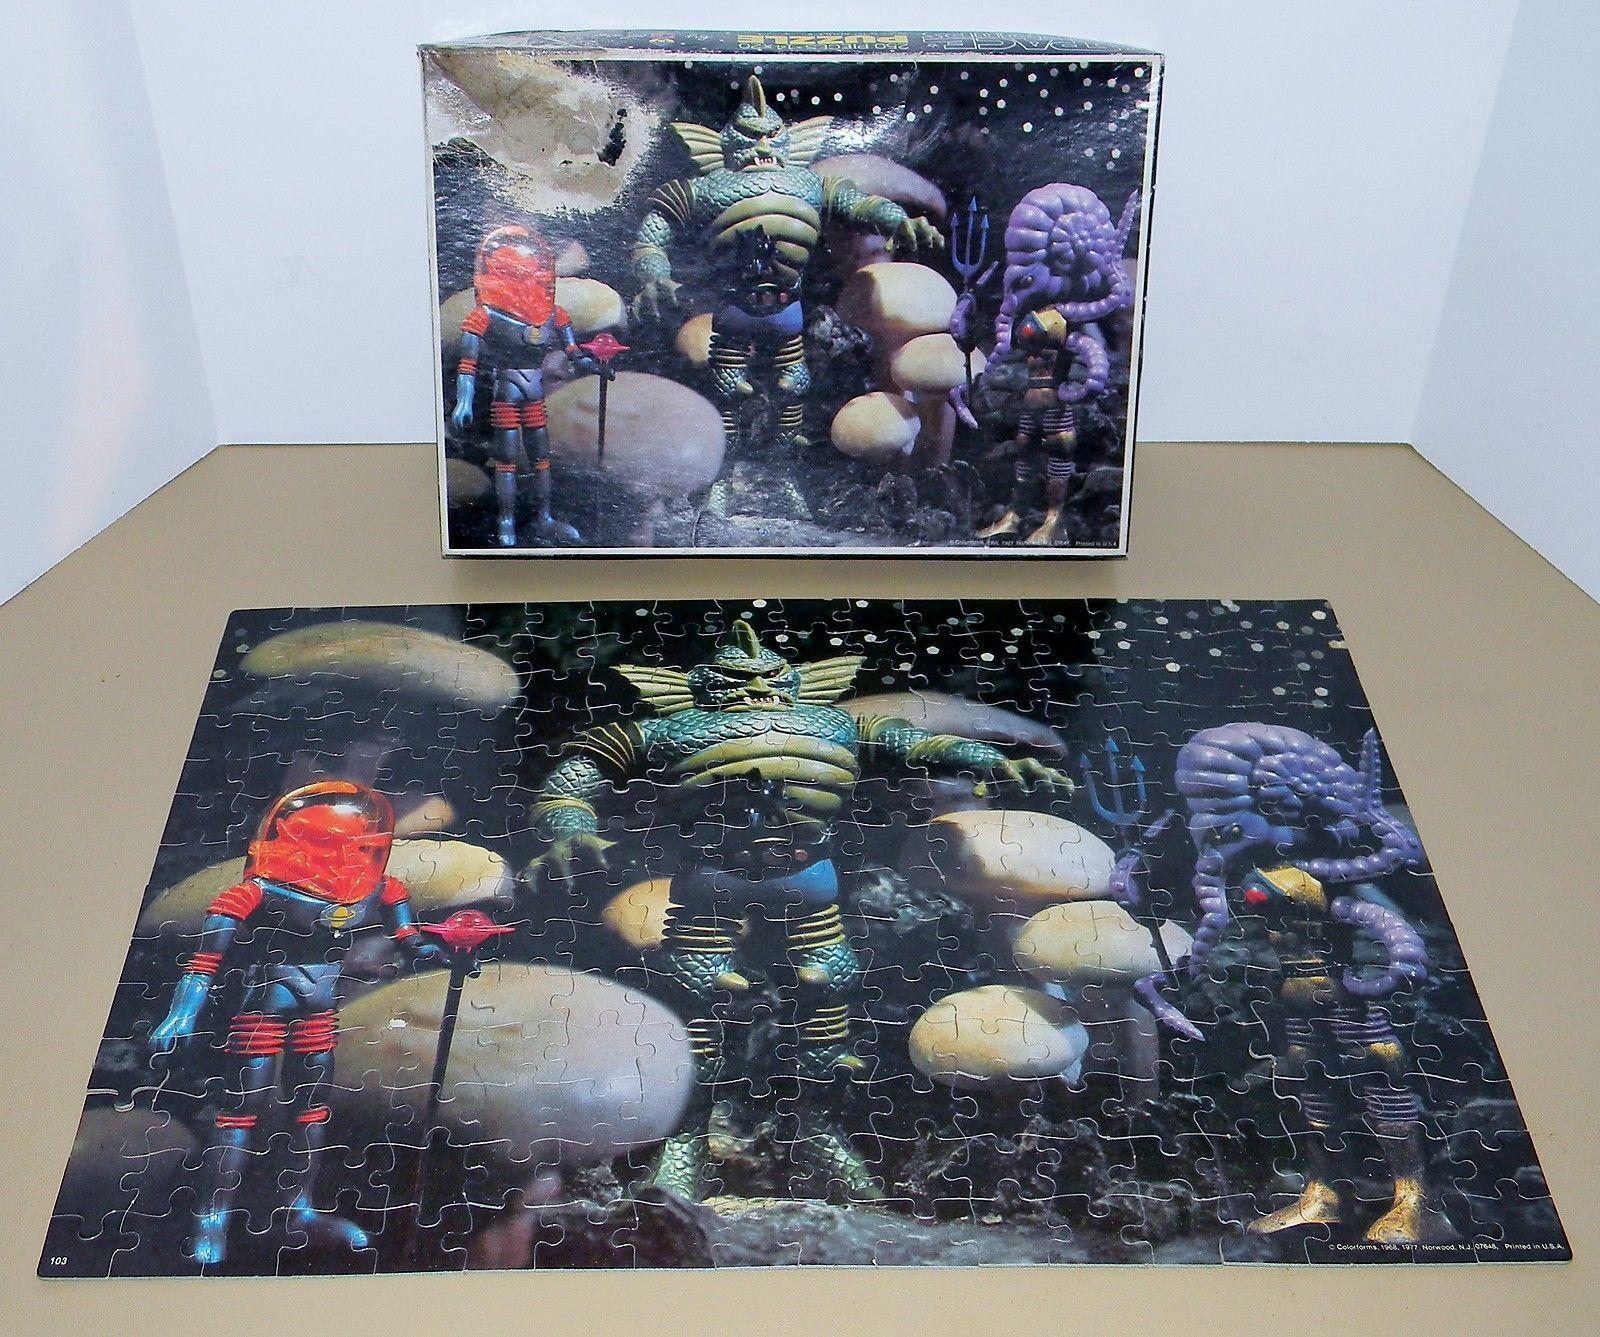 1977 Space Space Space Warriors colorforms Outer Space Man Alien Puzzle Astro Nautilus e33162